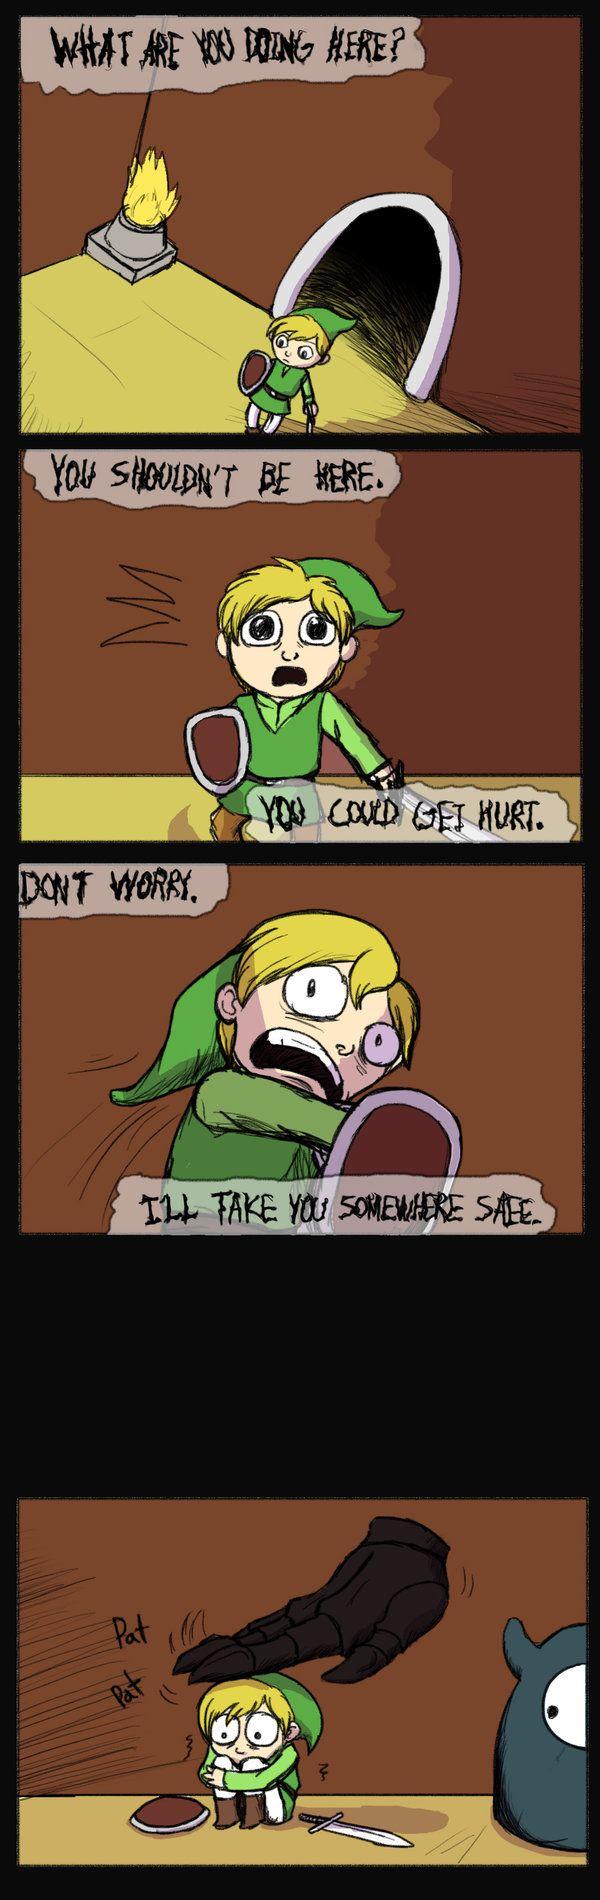 Legend of Zelda - Dungeon Keeper by Pandadrake.deviantart.com on @deviantART